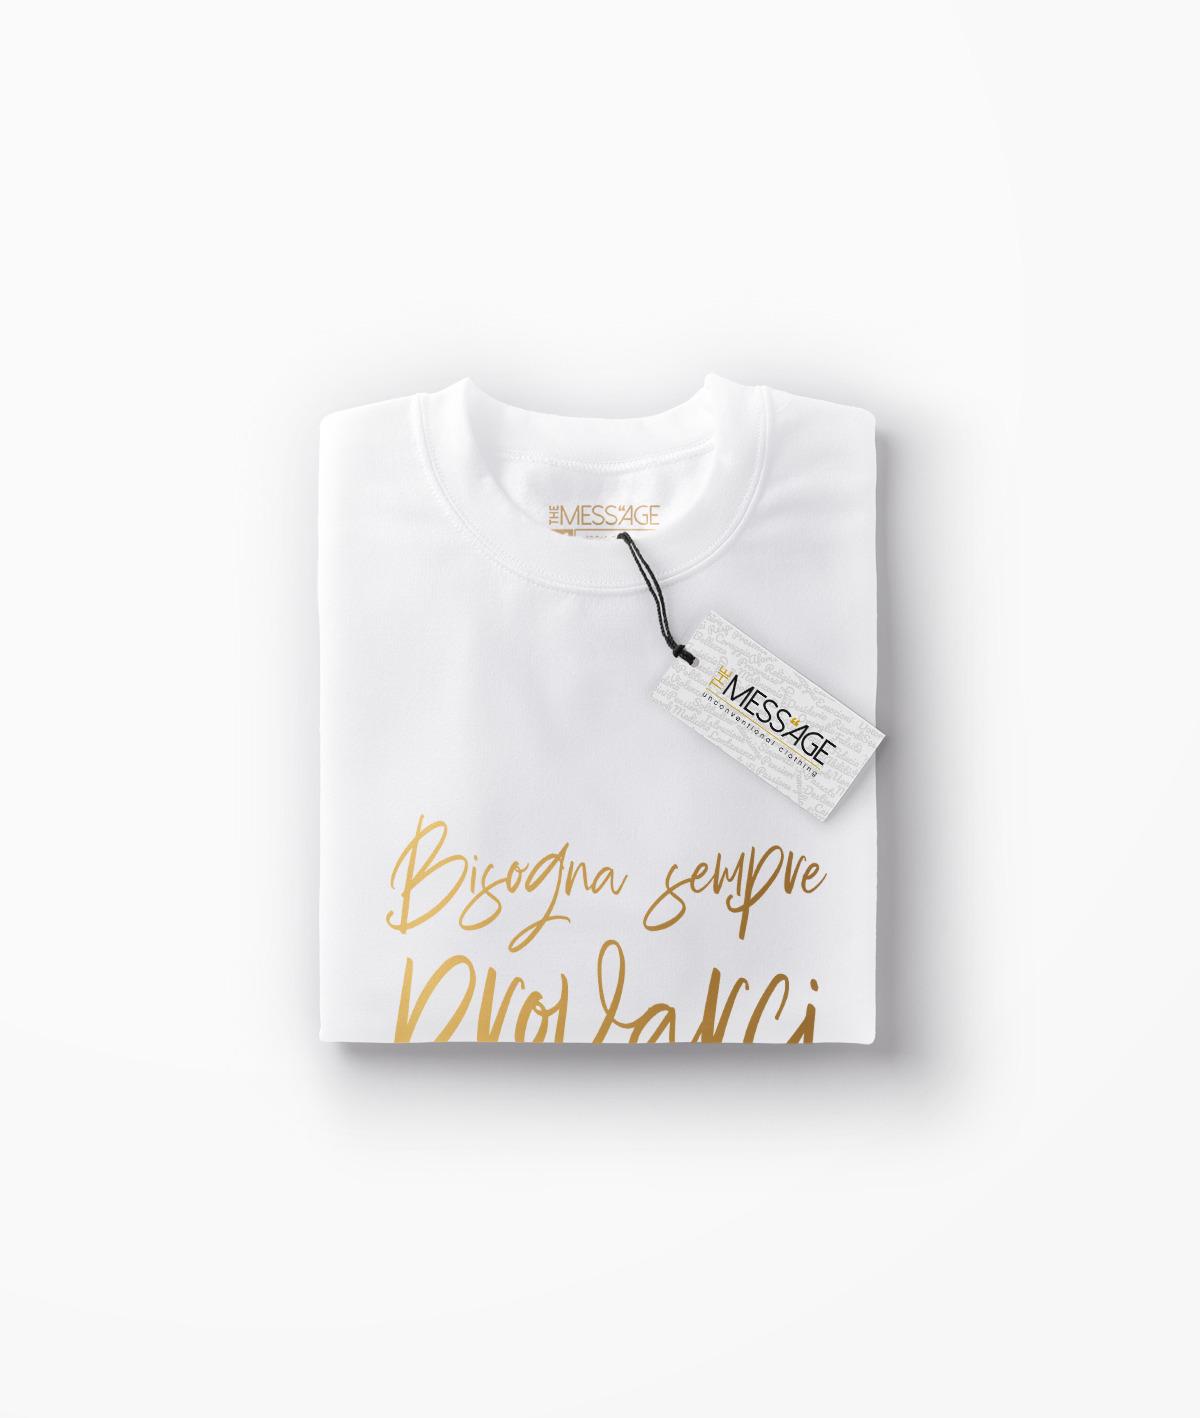 T-Shirt – Bisogna sempre provarci – Charles Bukowski